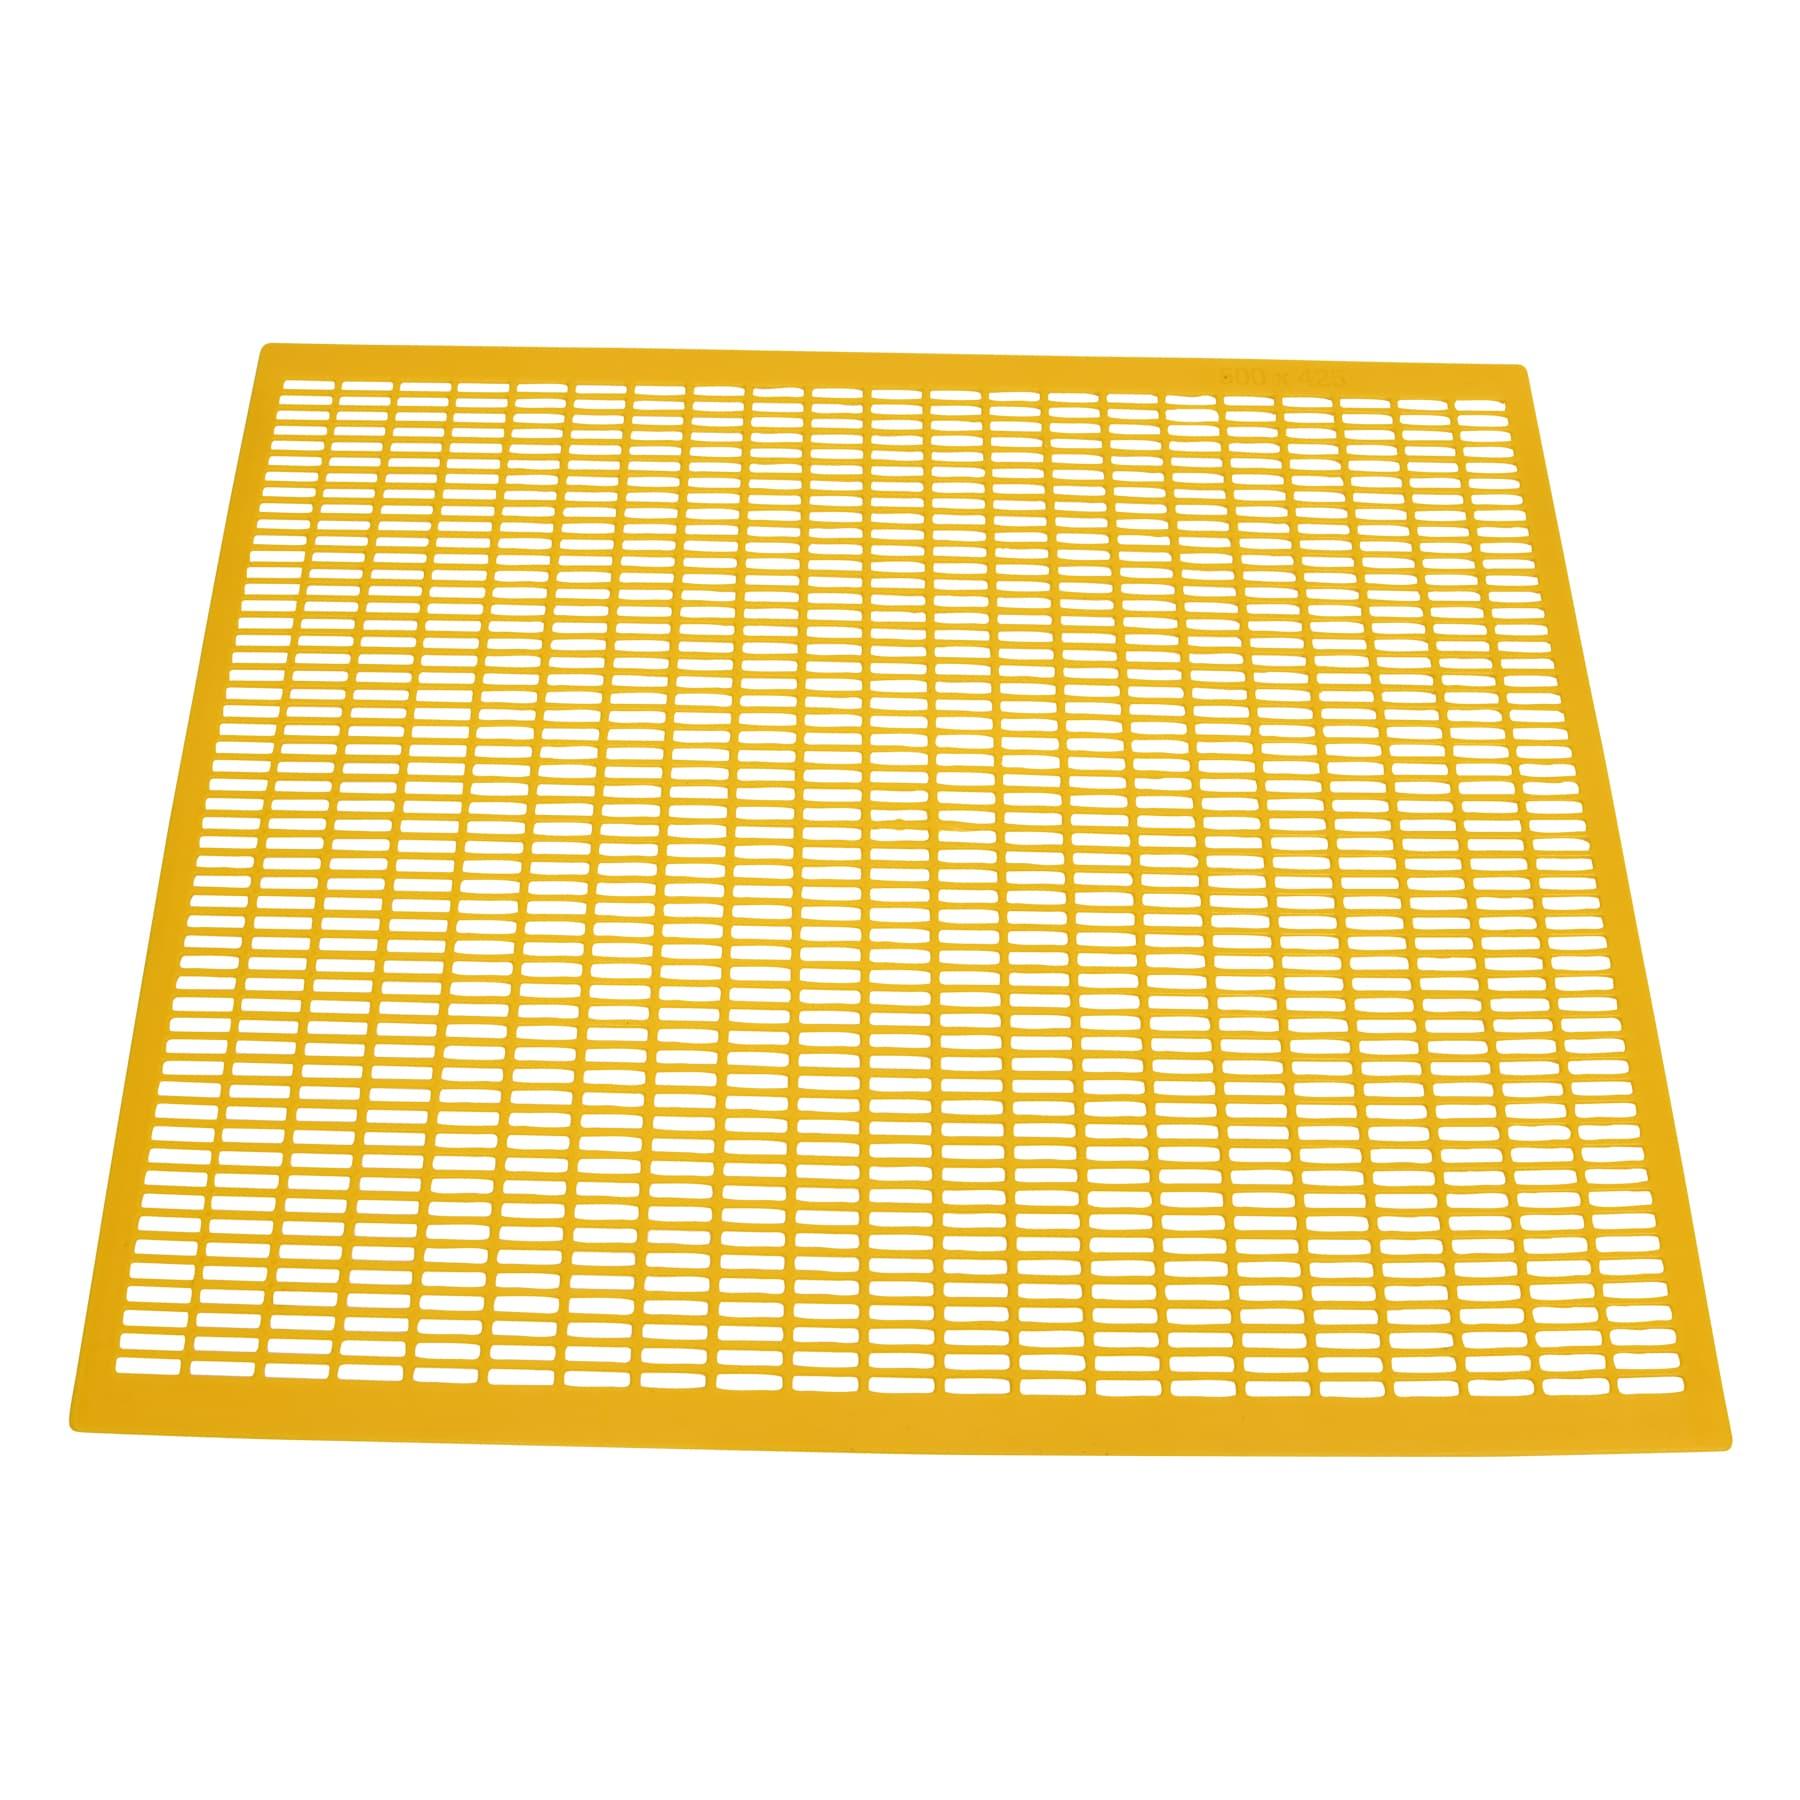 Absperrgitter Kunststoff, 425 x 500, Frankenbeute,  gelb